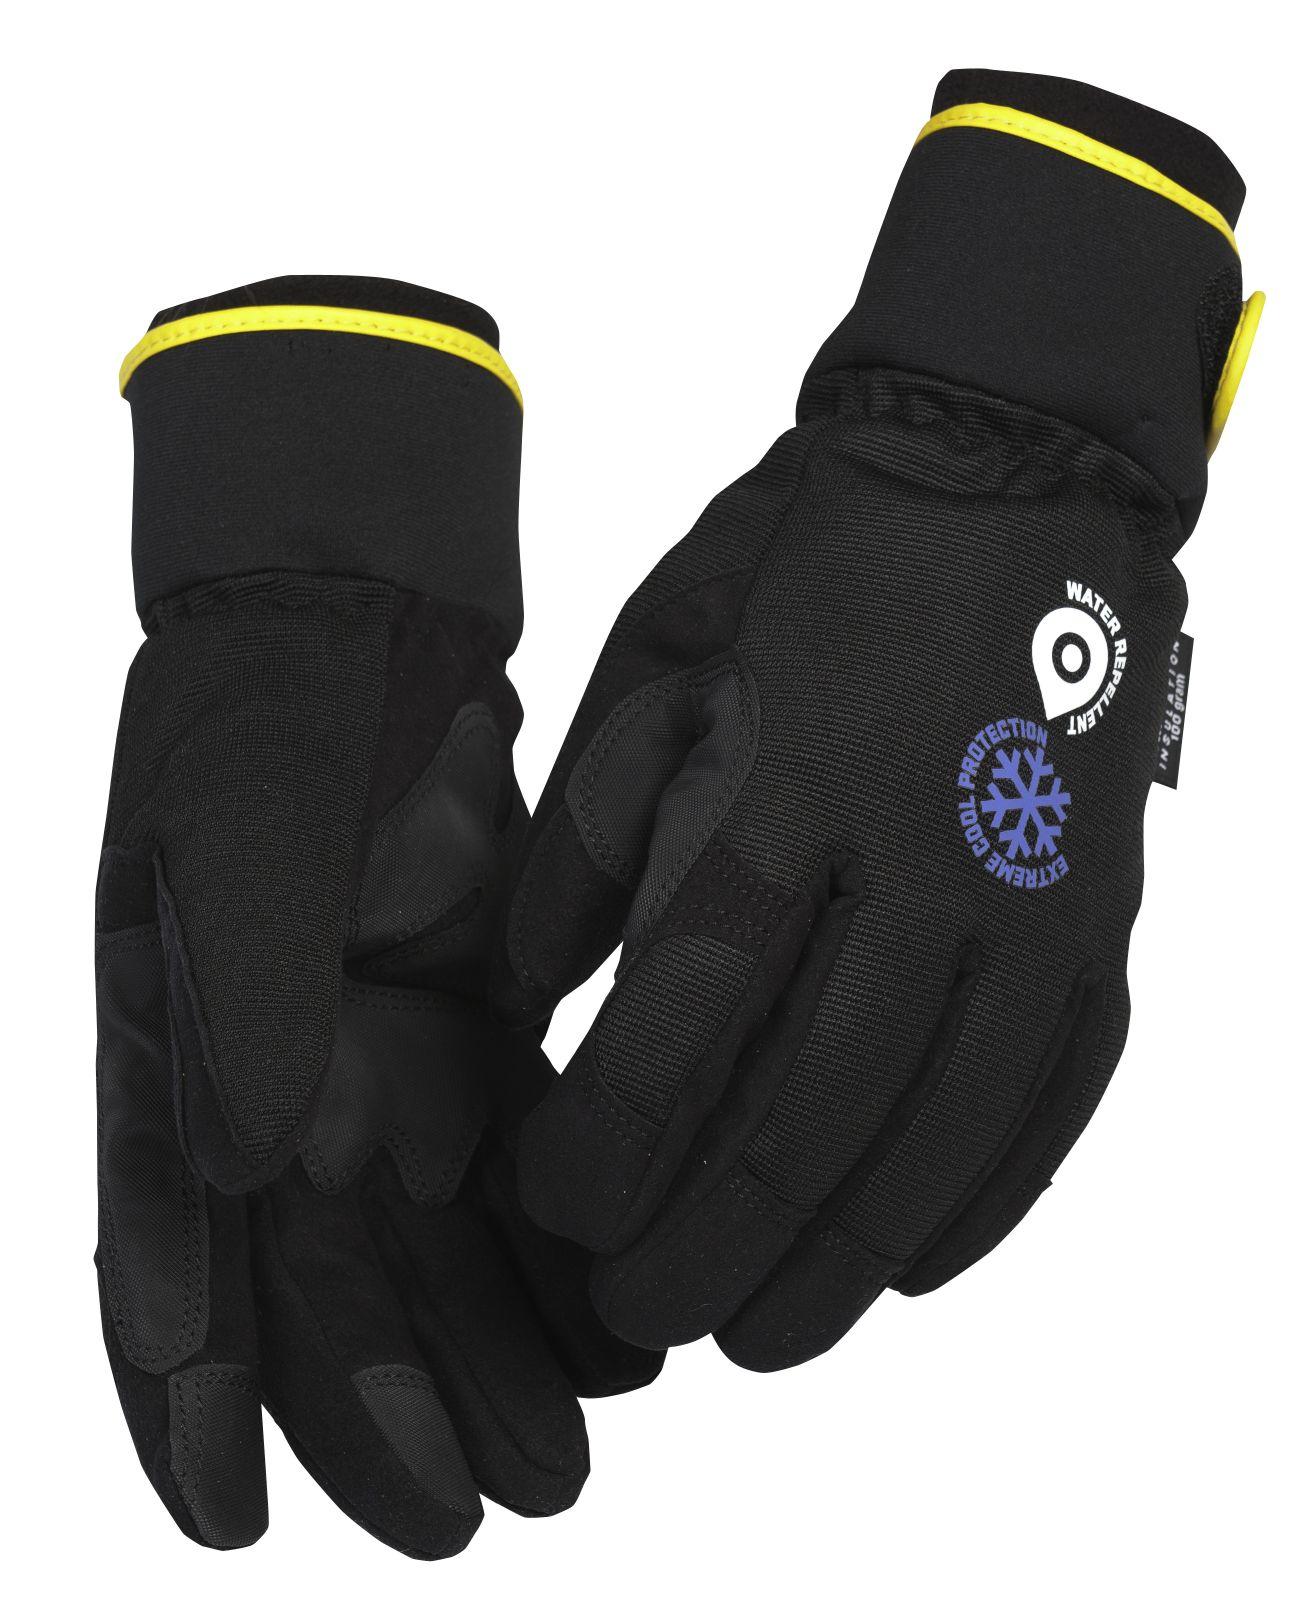 Blaklader Handschoenen 22493945 zwart(9900)